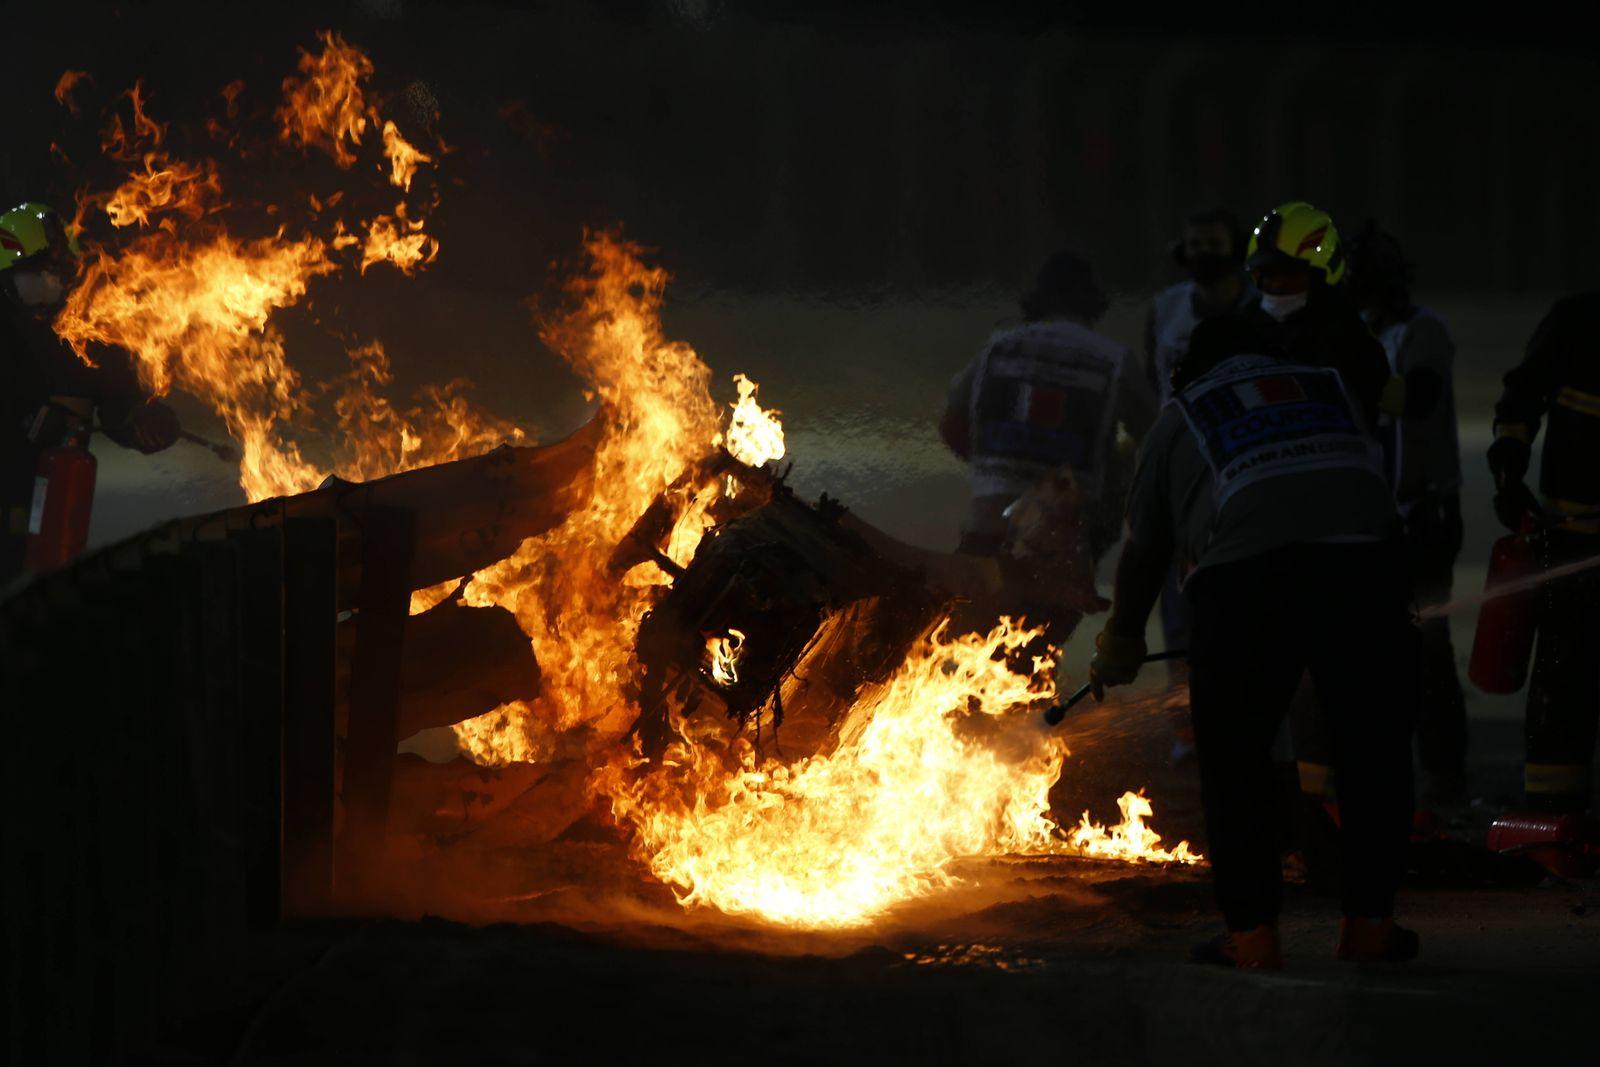 2020 Bahrain GP BAHRAIN INTERNATIONAL CIRCUIT, BAHRAIN - NOVEMBER 29: Marshals extinguish the flames after a big crash